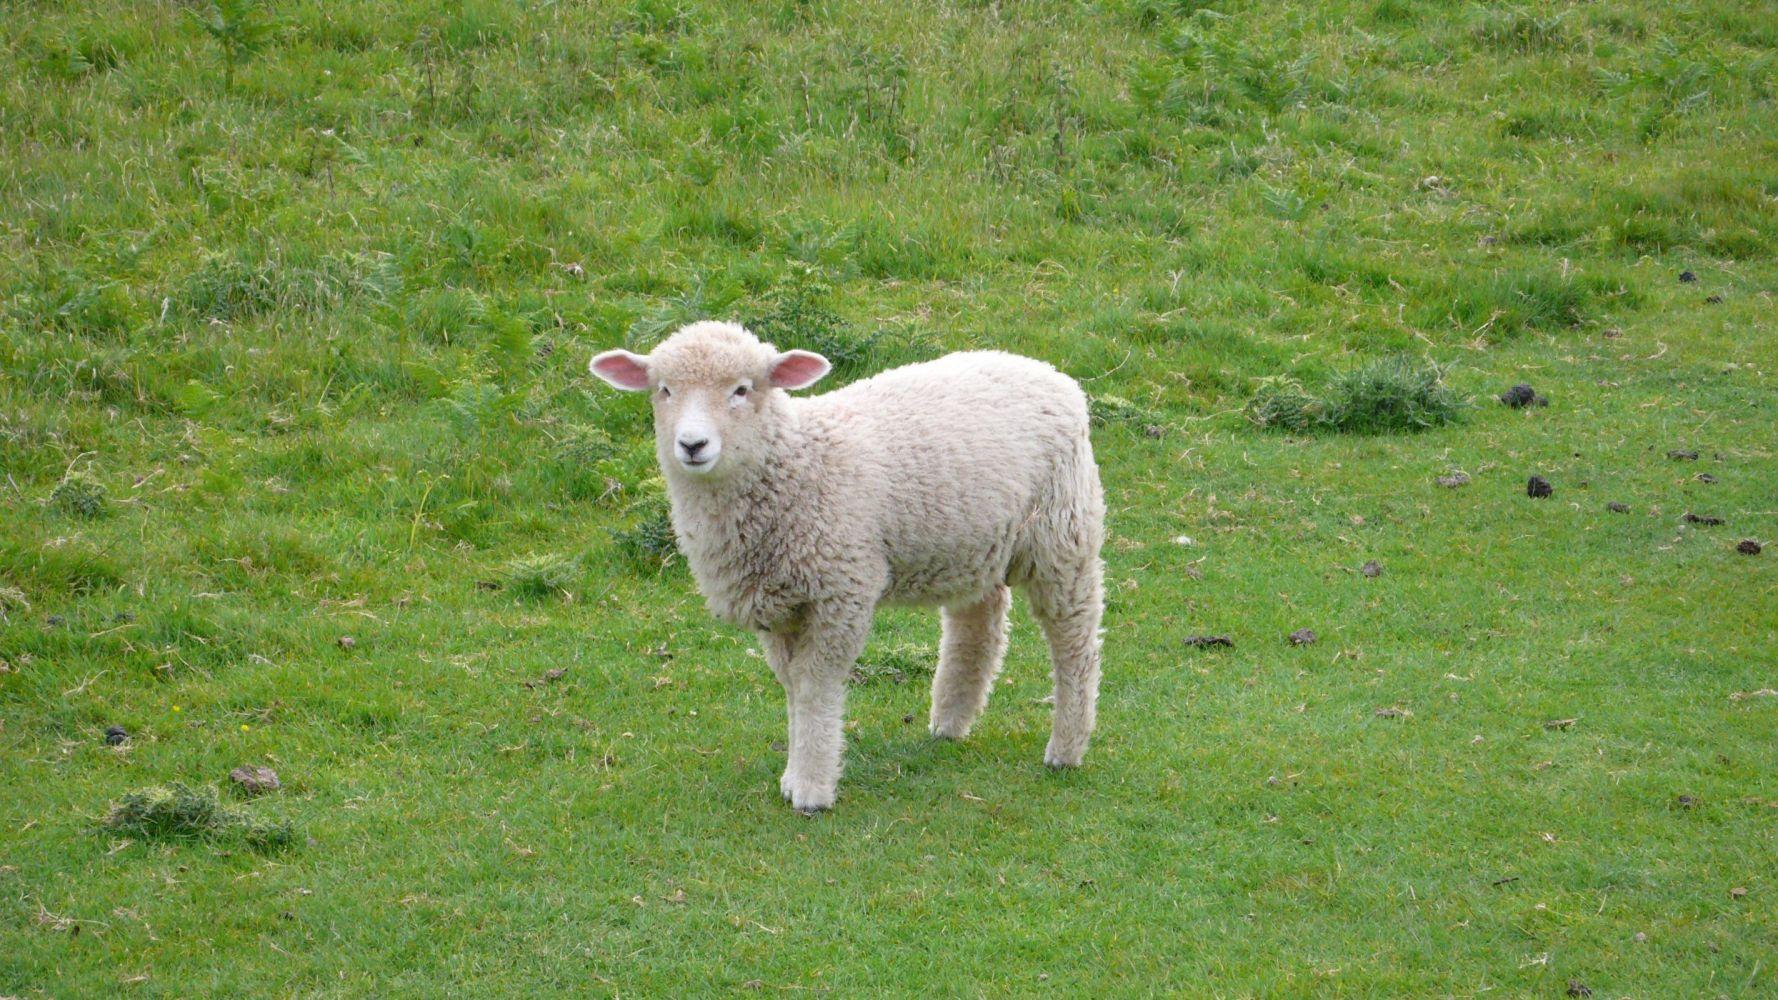 cute lamb in field